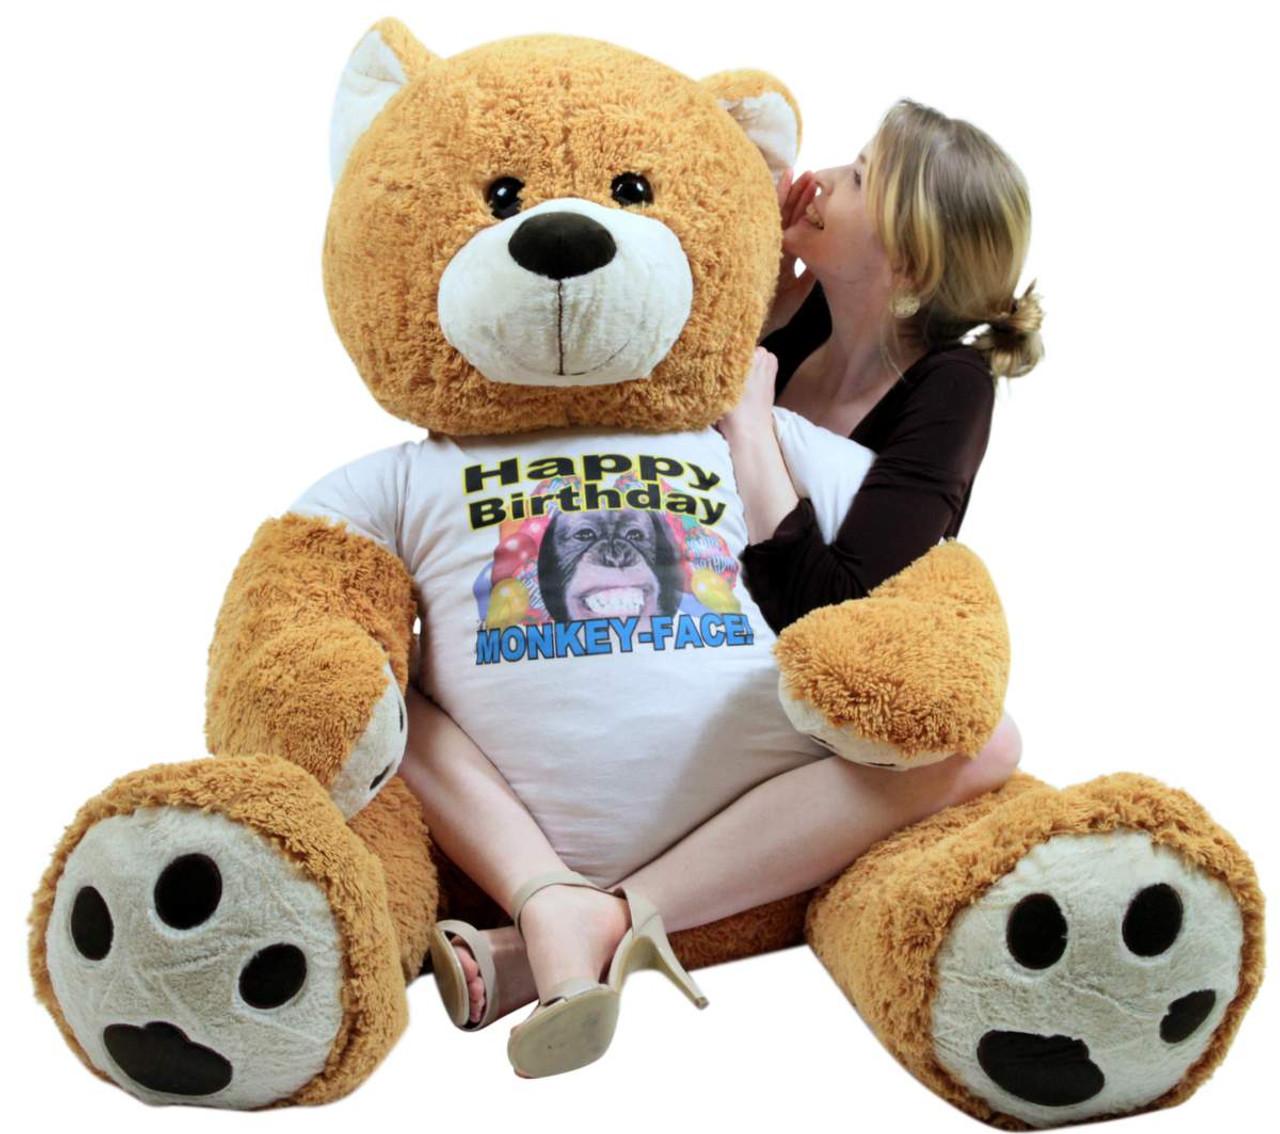 Giant Happy Birthday Teddy Bear 55 Inches Honey Brown ...